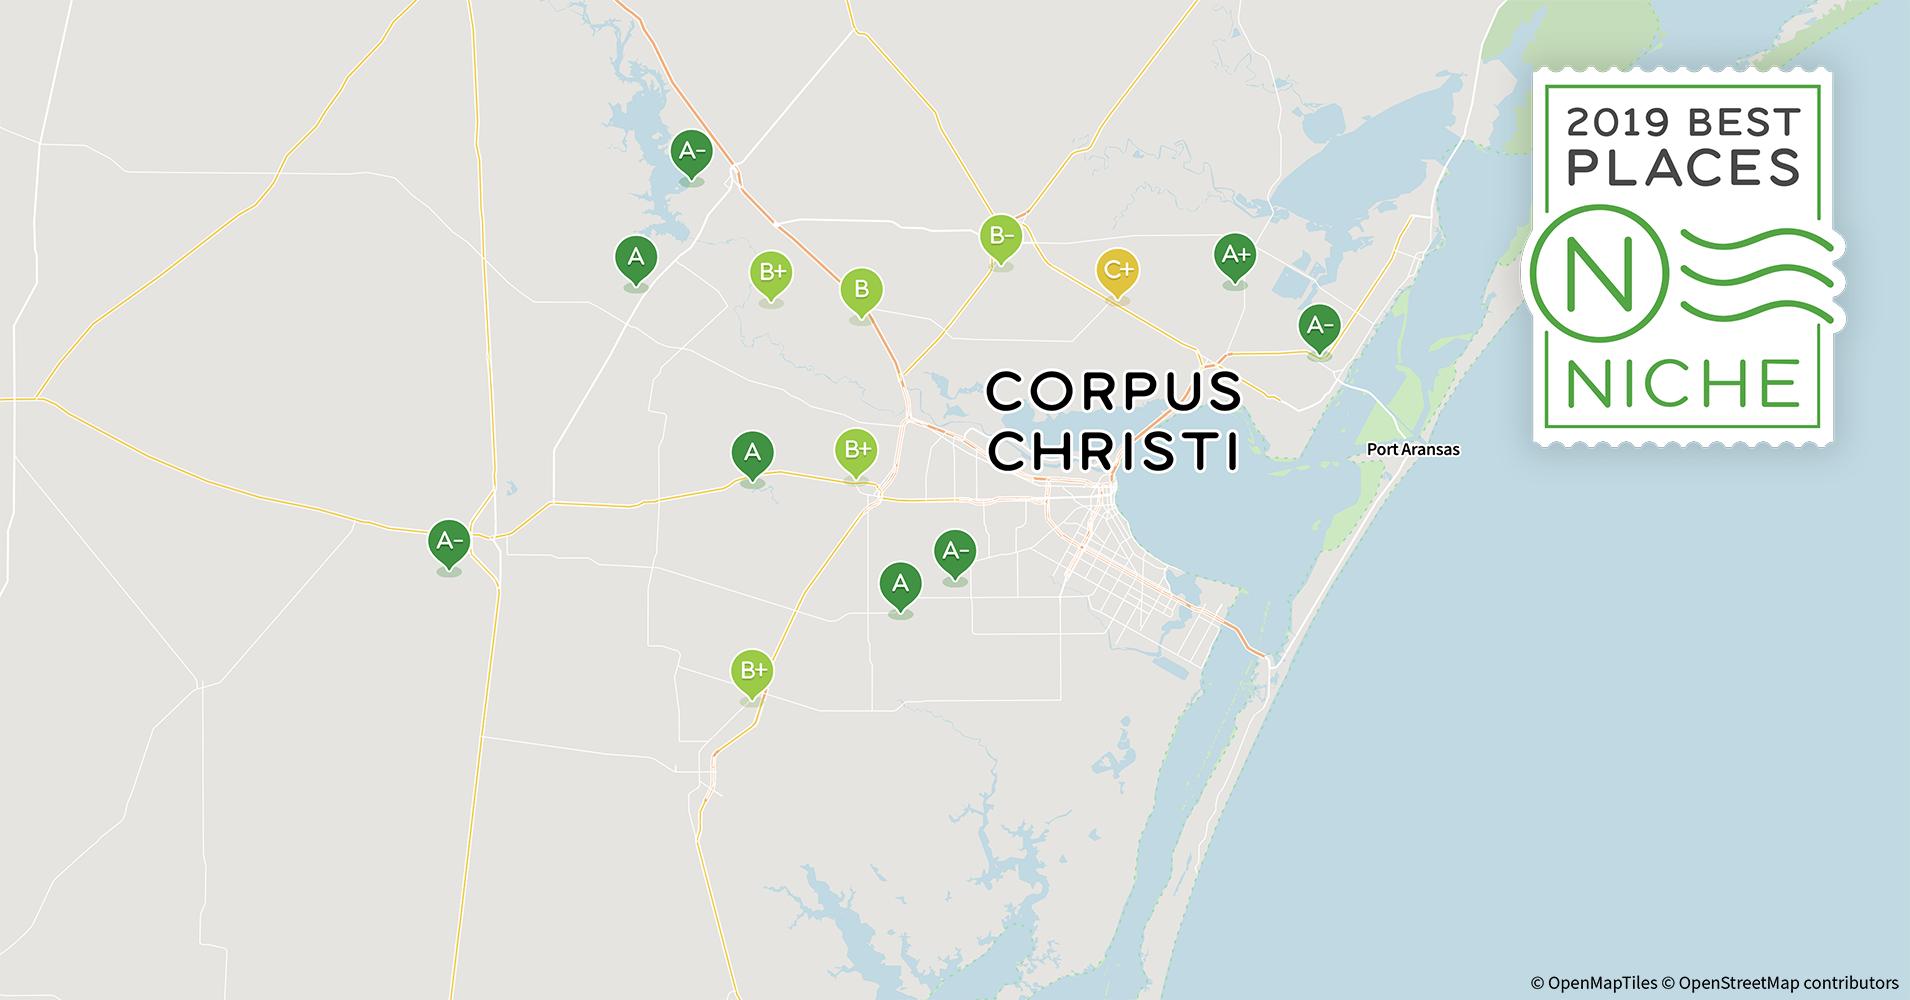 2019 Best Places to Retire in Corpus Christi Area - Niche